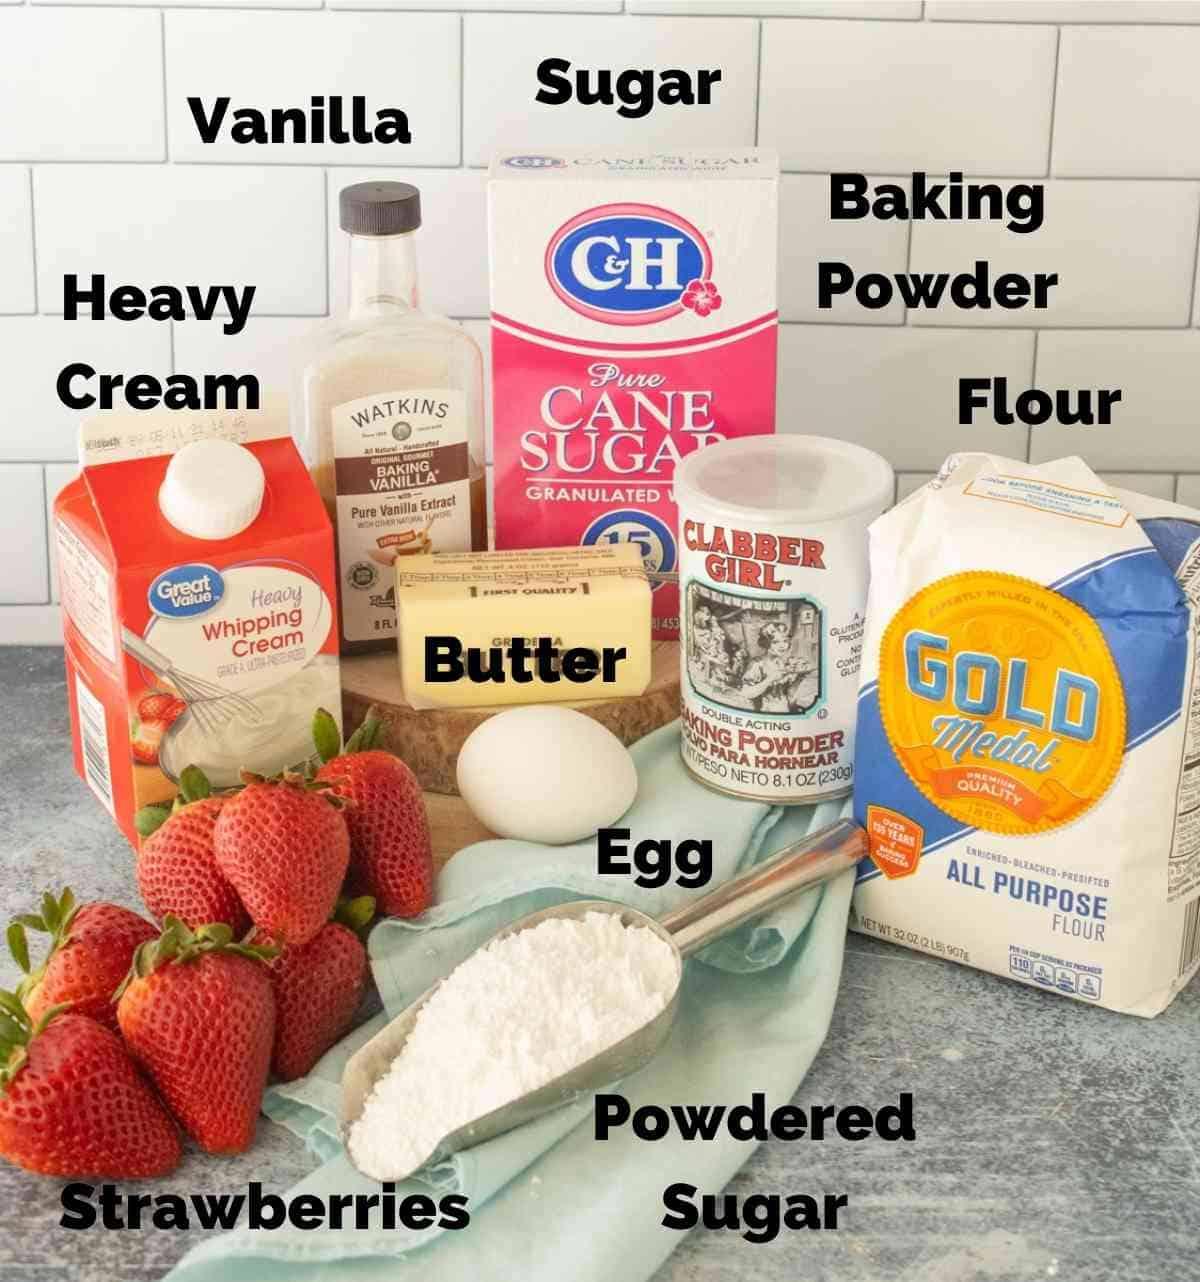 Ingredients for strawberry shortcake.